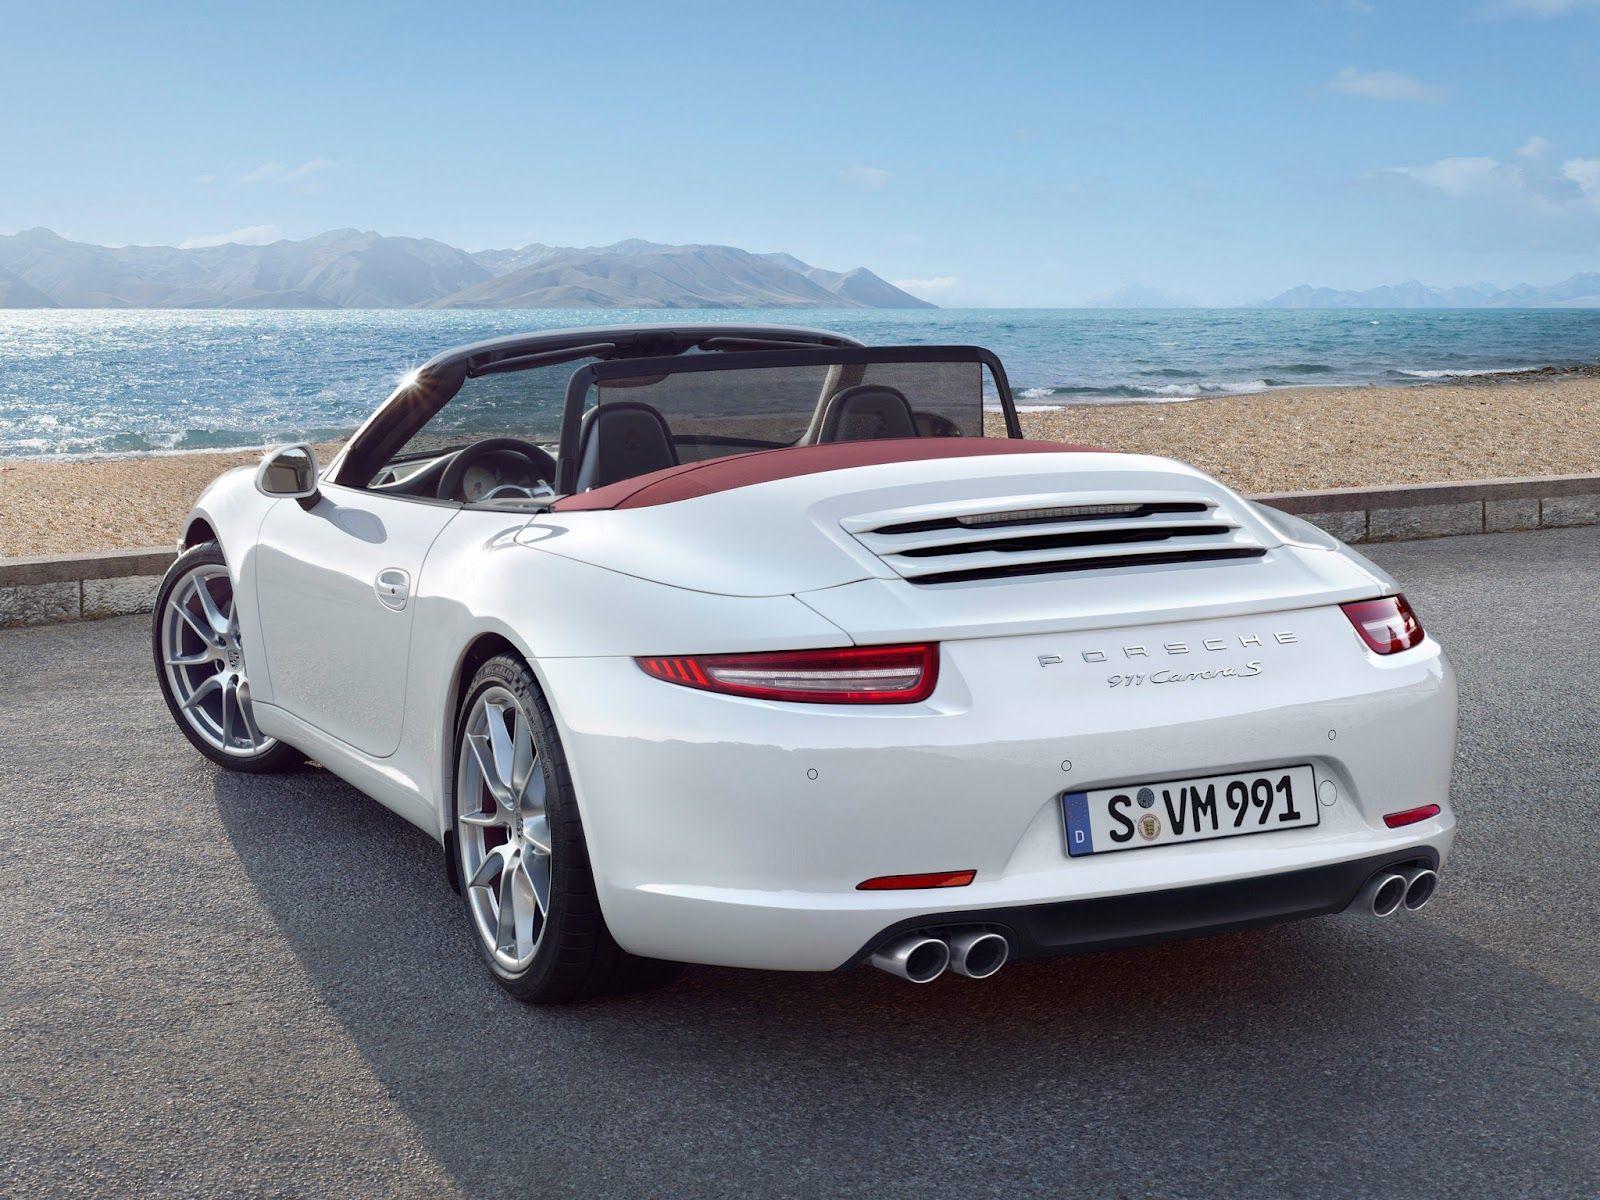 2016 Porsche 911 Carrera 4 GTS Cabriolet